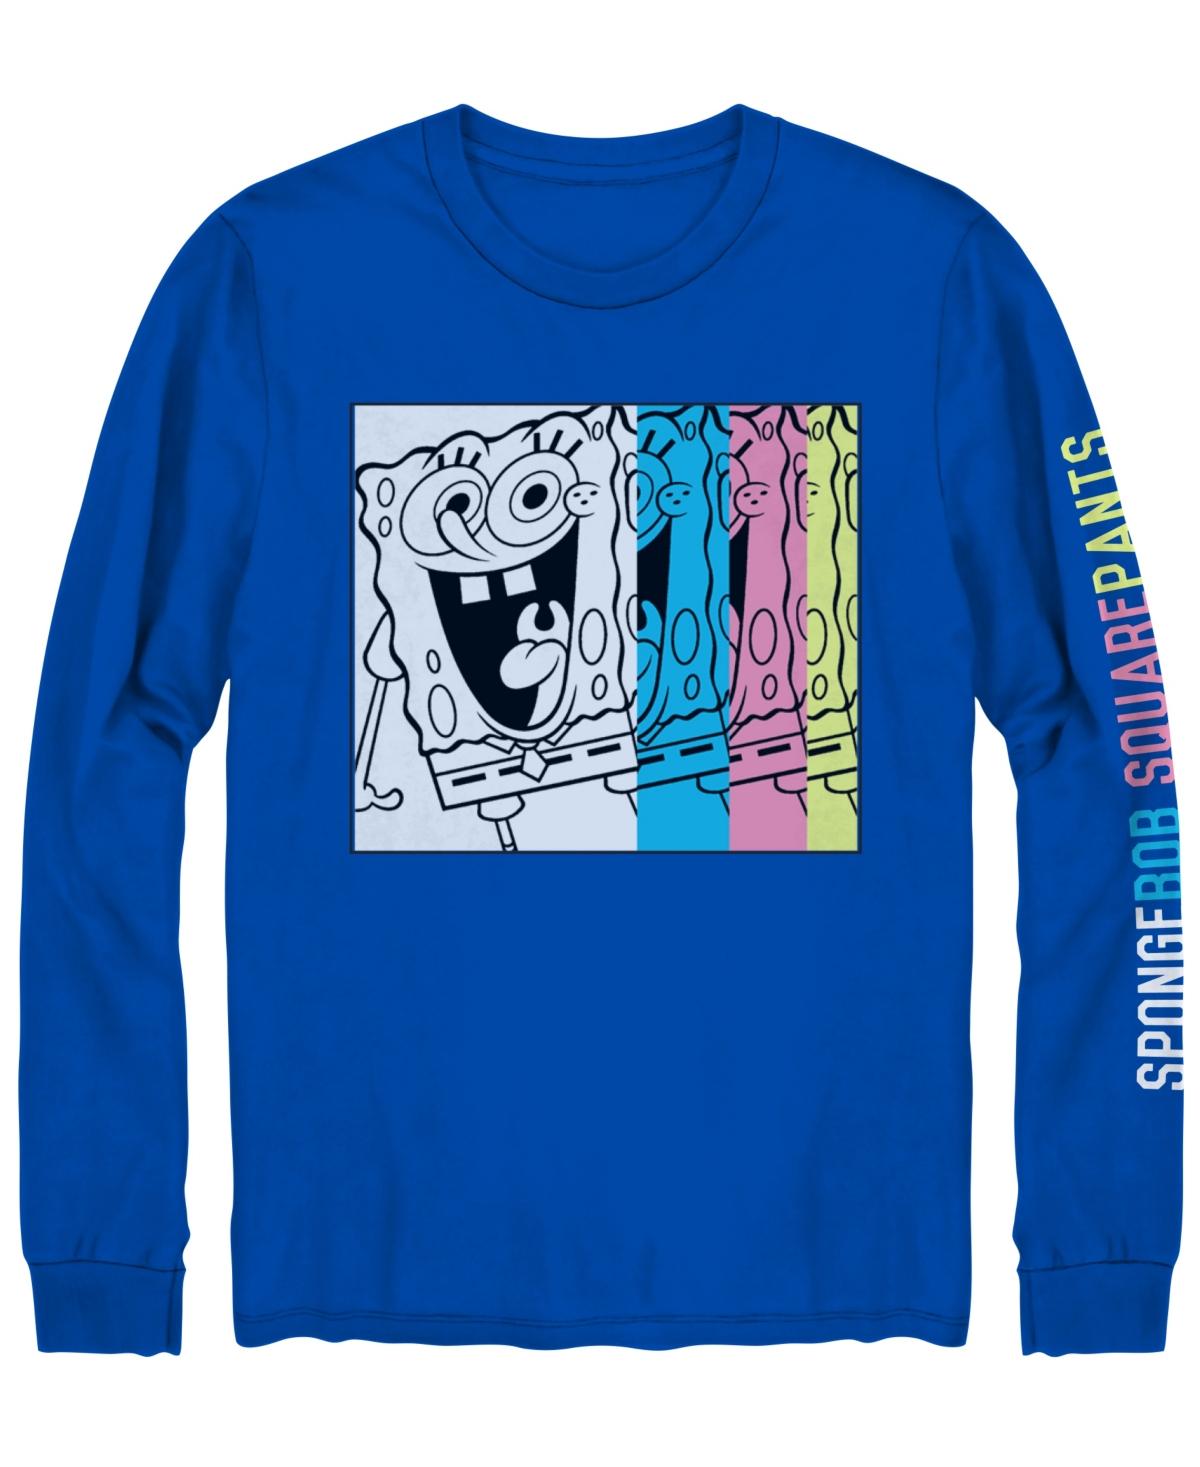 Men's Freeze Frame Long Sleeve Graphic T-shirt